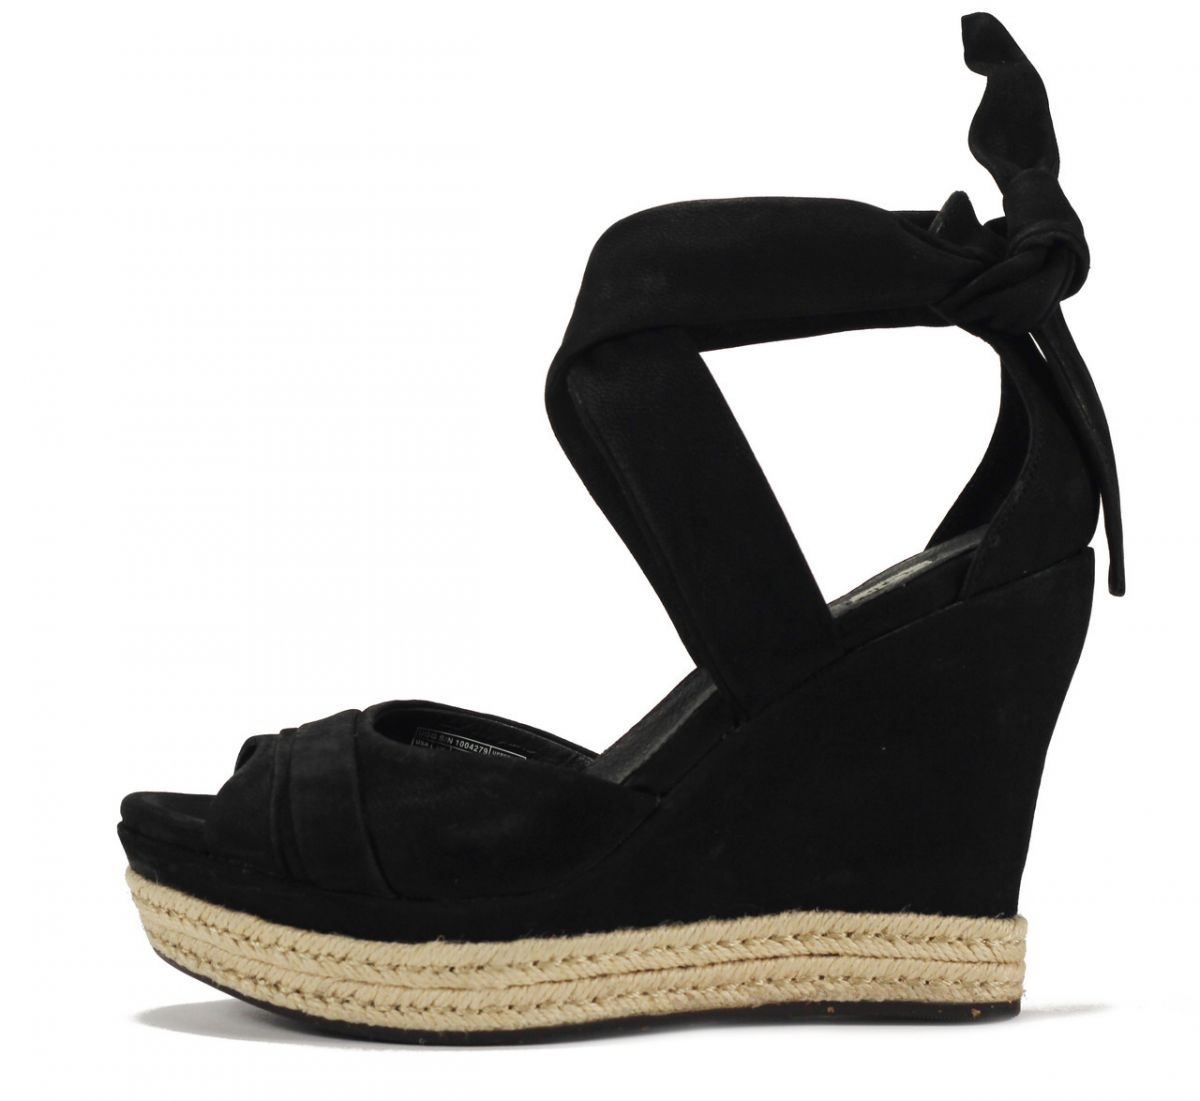 91c897eaf4 UGG Australia for Women: Lucy Black Wedge Sandal BLACK. Special Price  $128.99 Regular Price $160.00